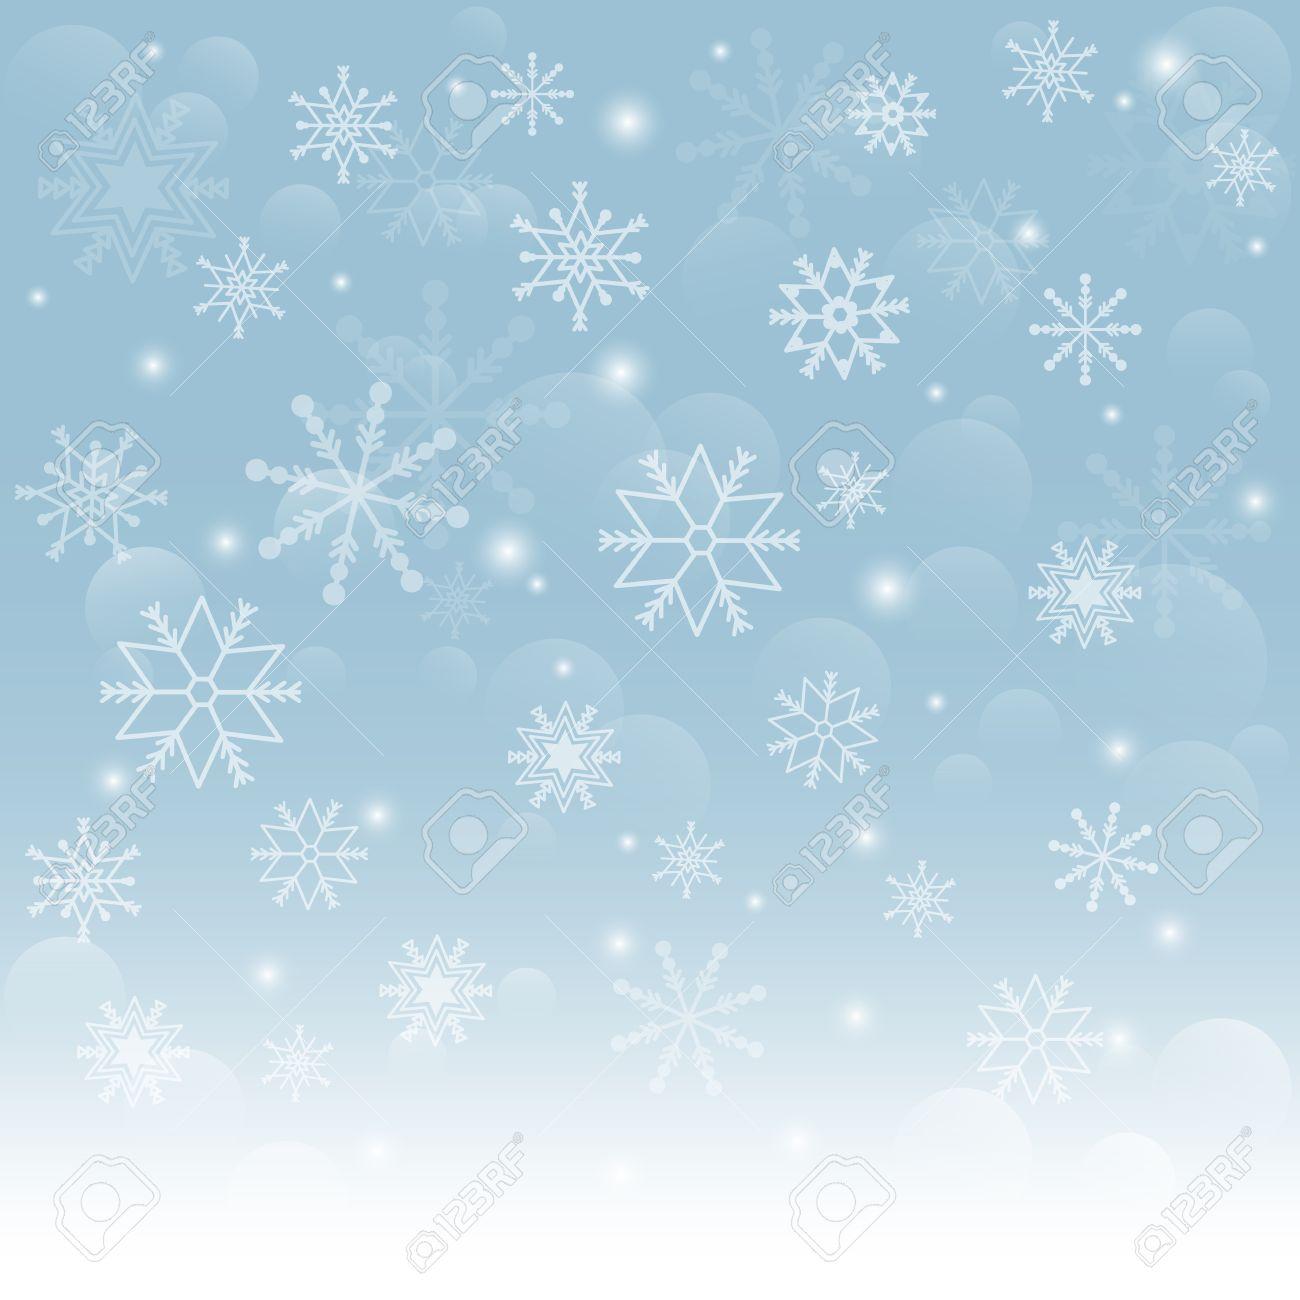 Christmas snowflakes background Falling snowflakes on snow Vector illustration - 22707220